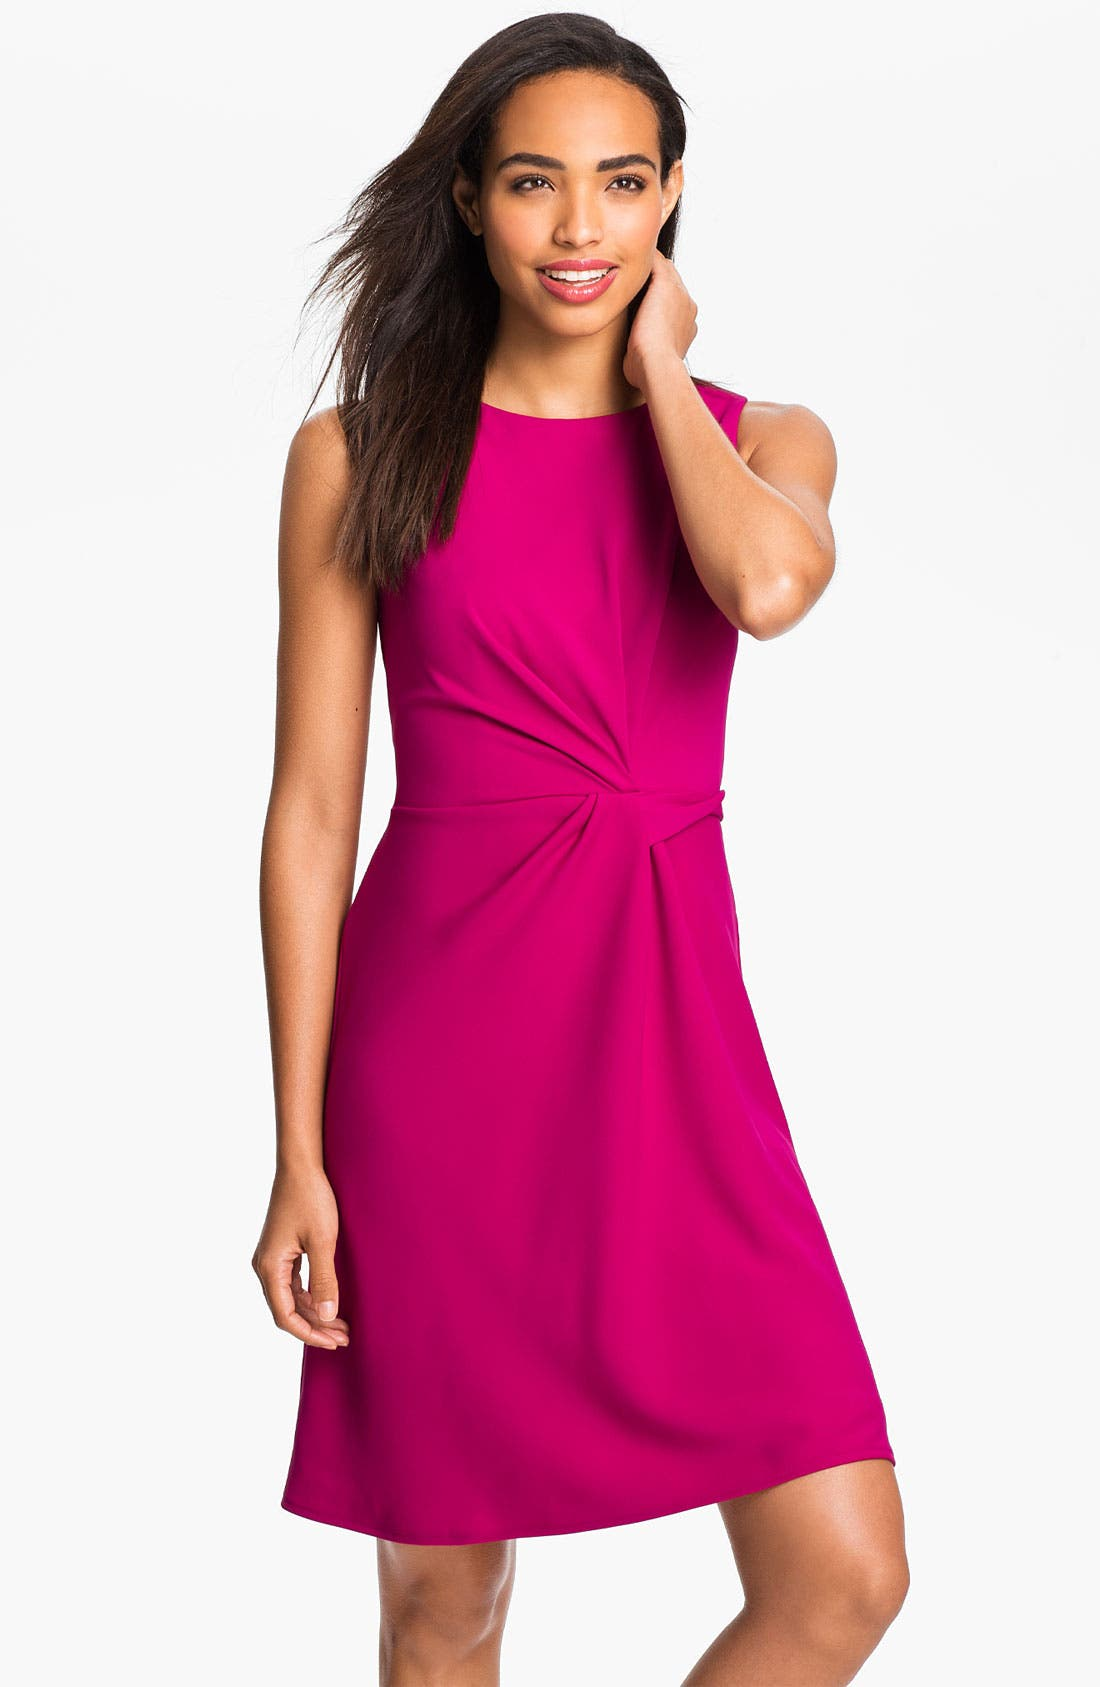 Alternate Image 1 Selected - Donna Ricco Sleeveless Side Tie Dress (Petite)